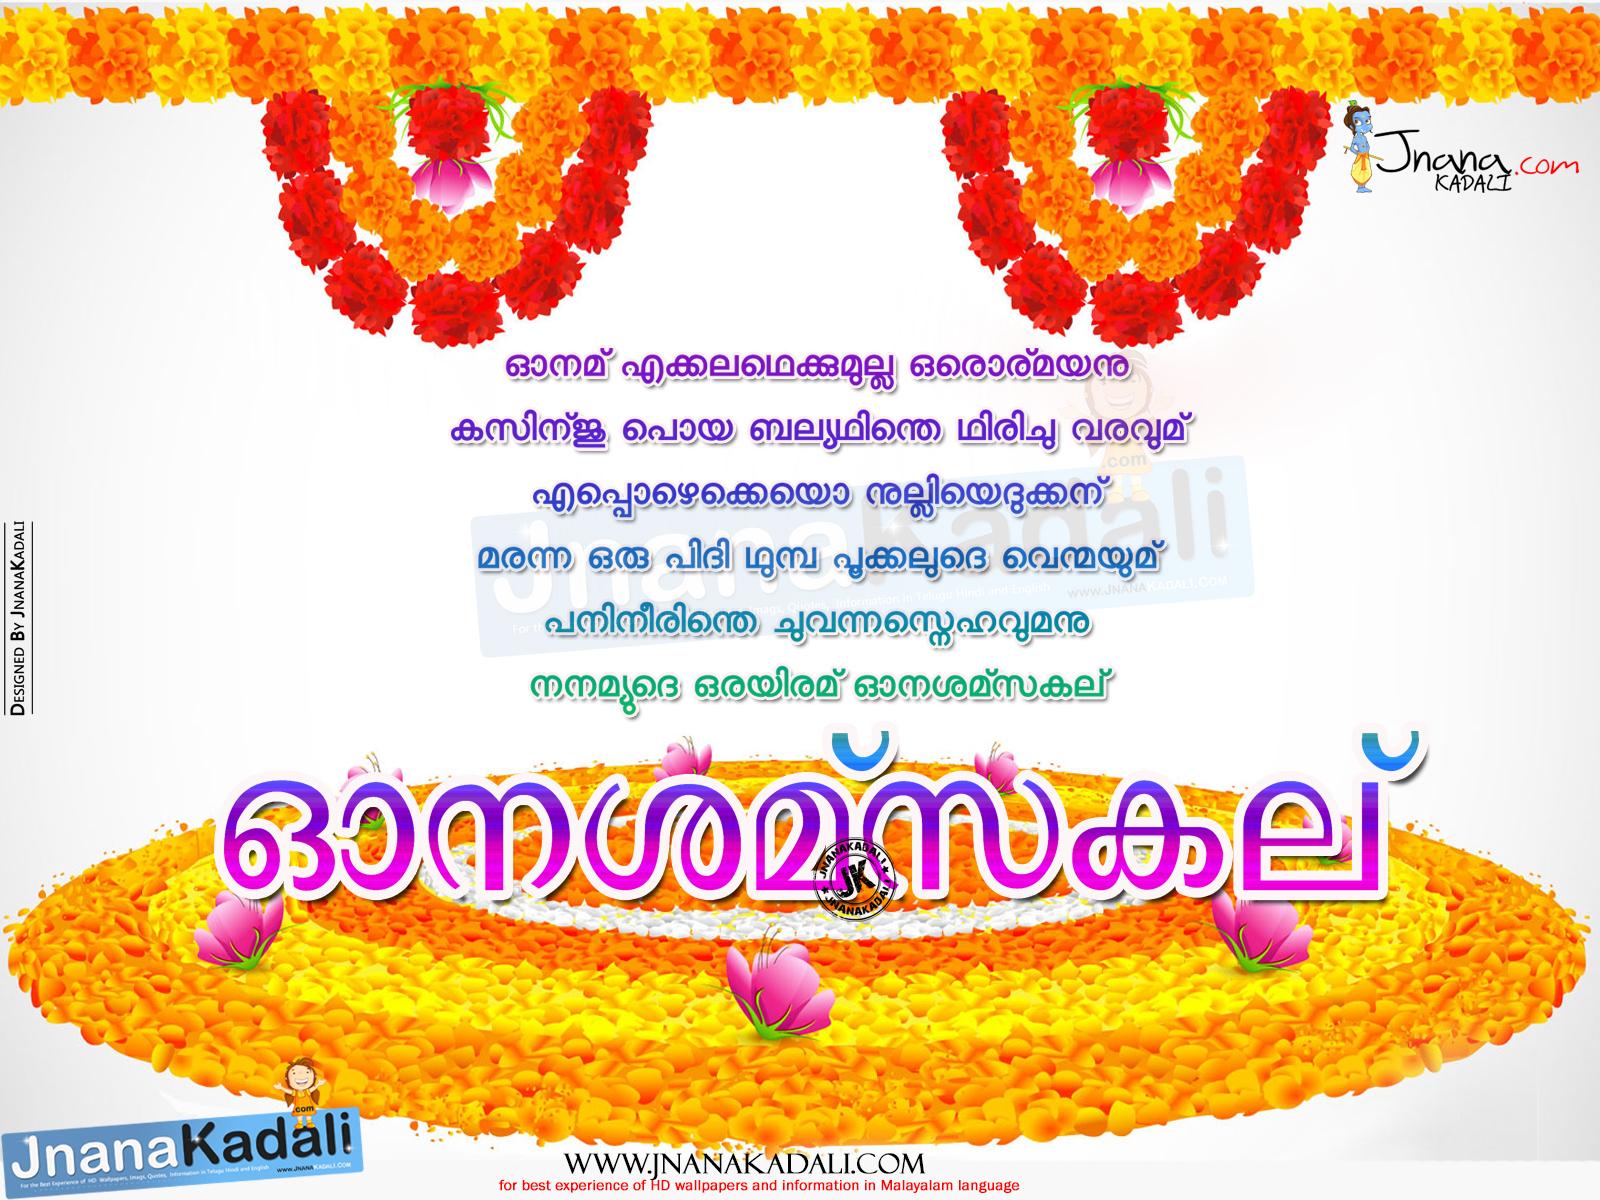 Onam Hd Wallpapers In Malayalam Labzada Wallpaper